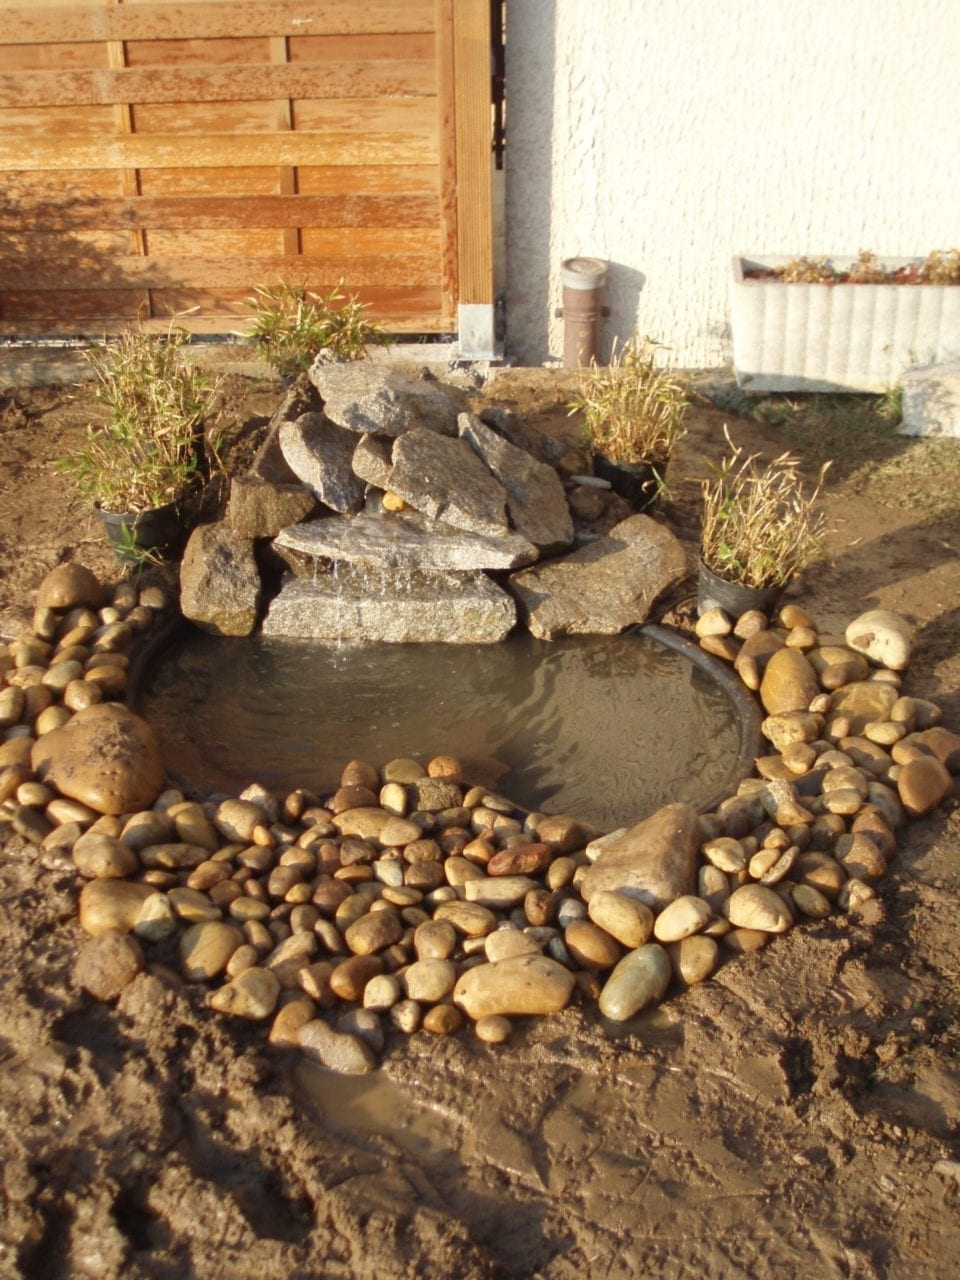 Photo d'un bassin aquatique avec des berges en pierre